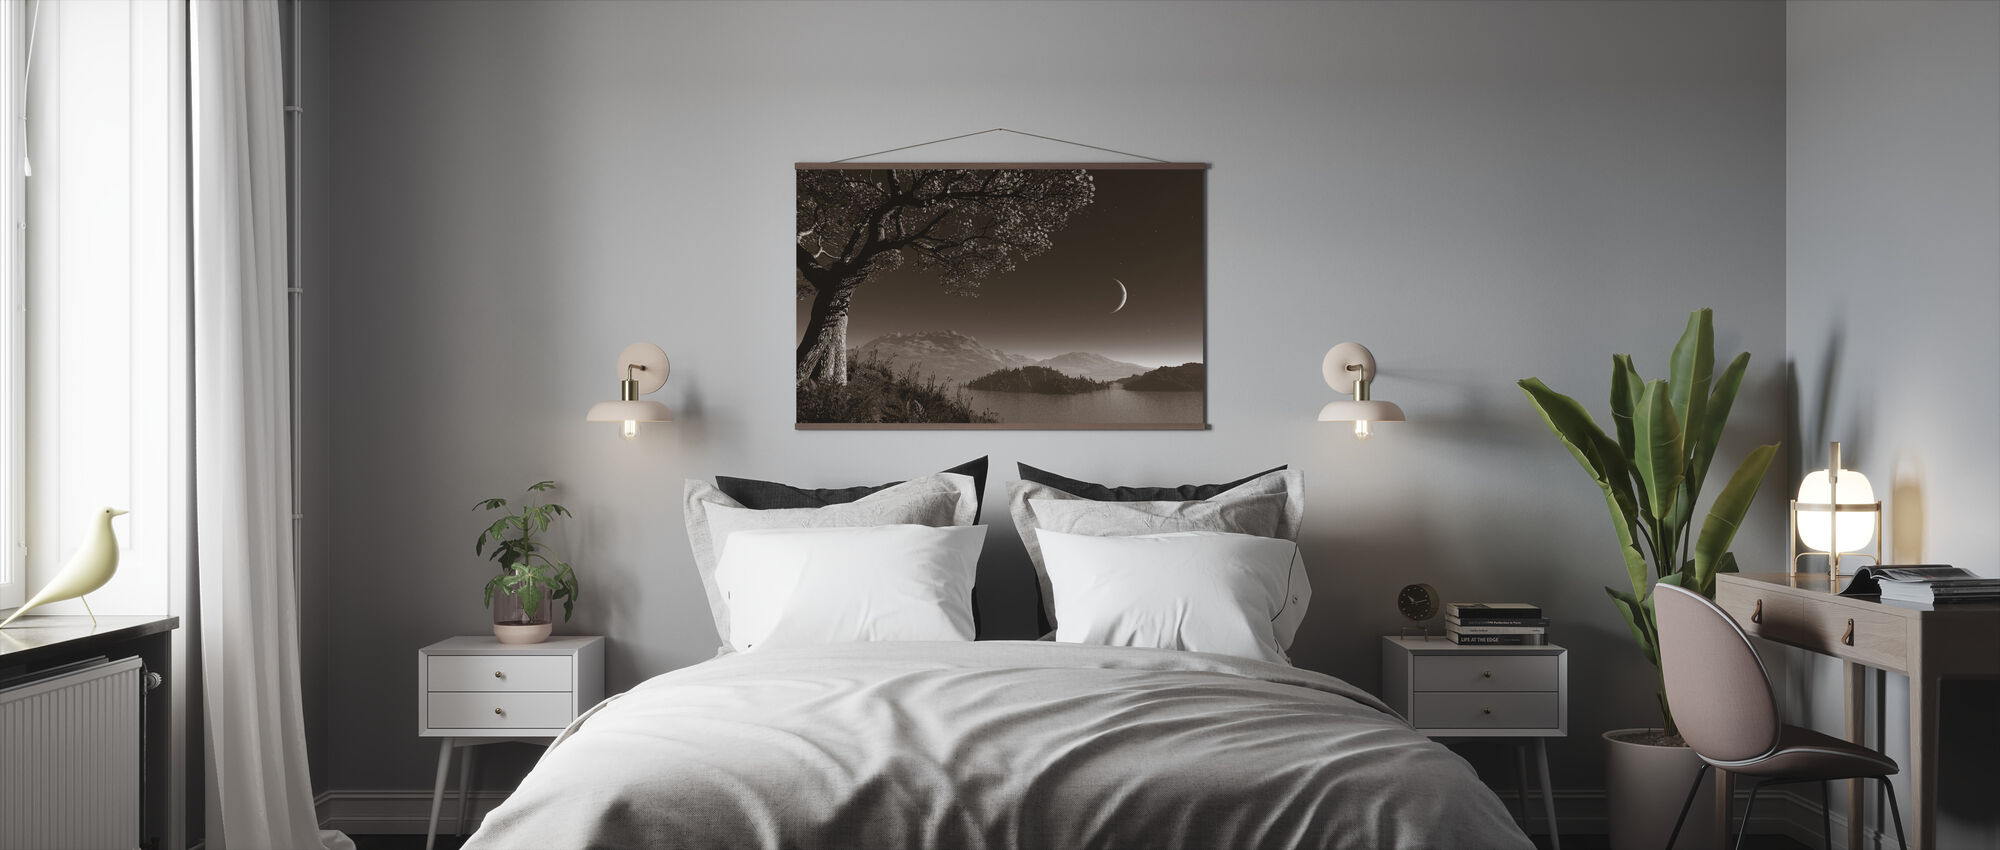 Romantic Night - Poster - Bedroom